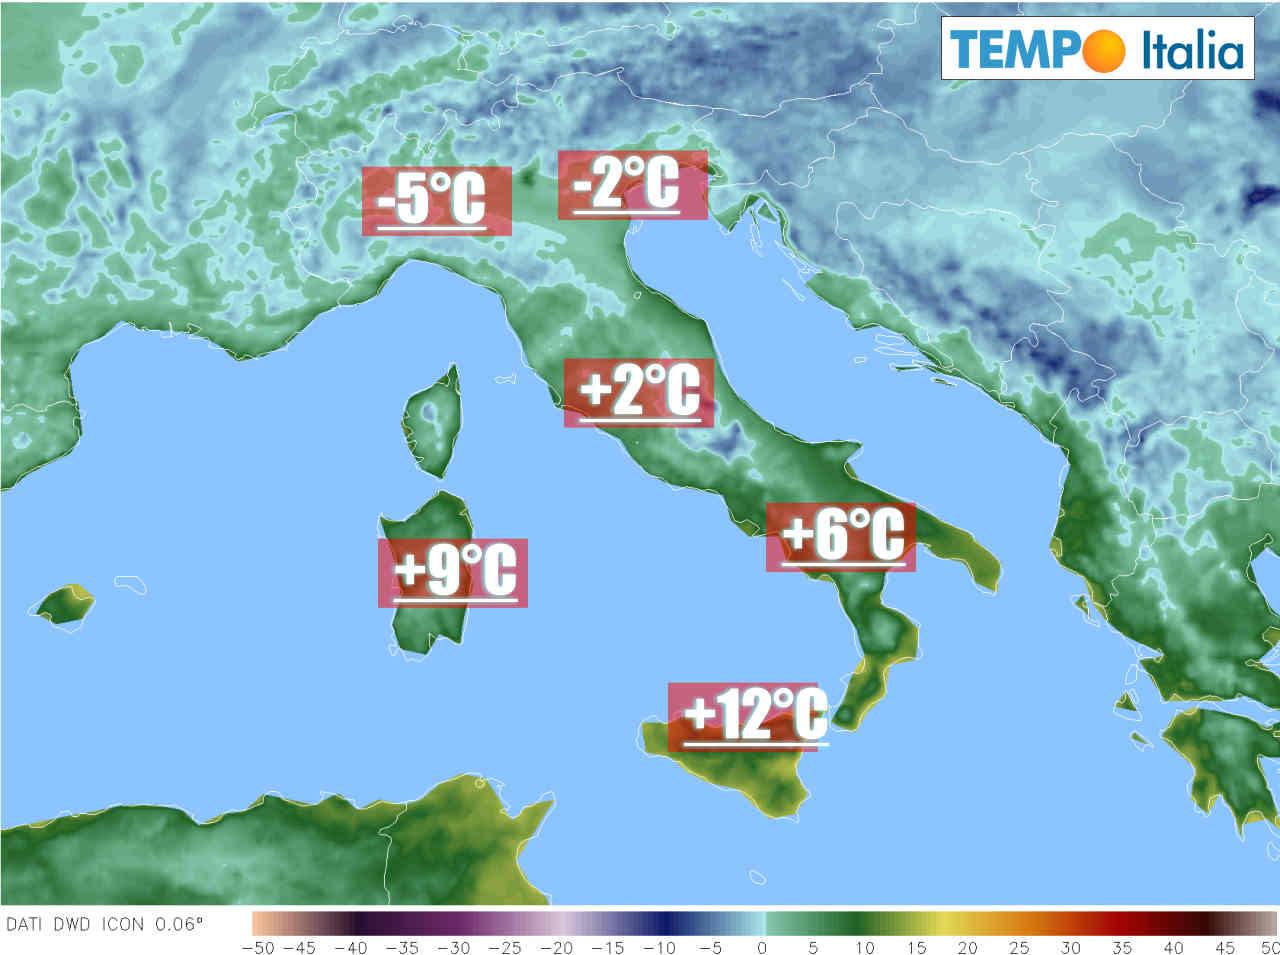 Gelate intense al Nord Italia.